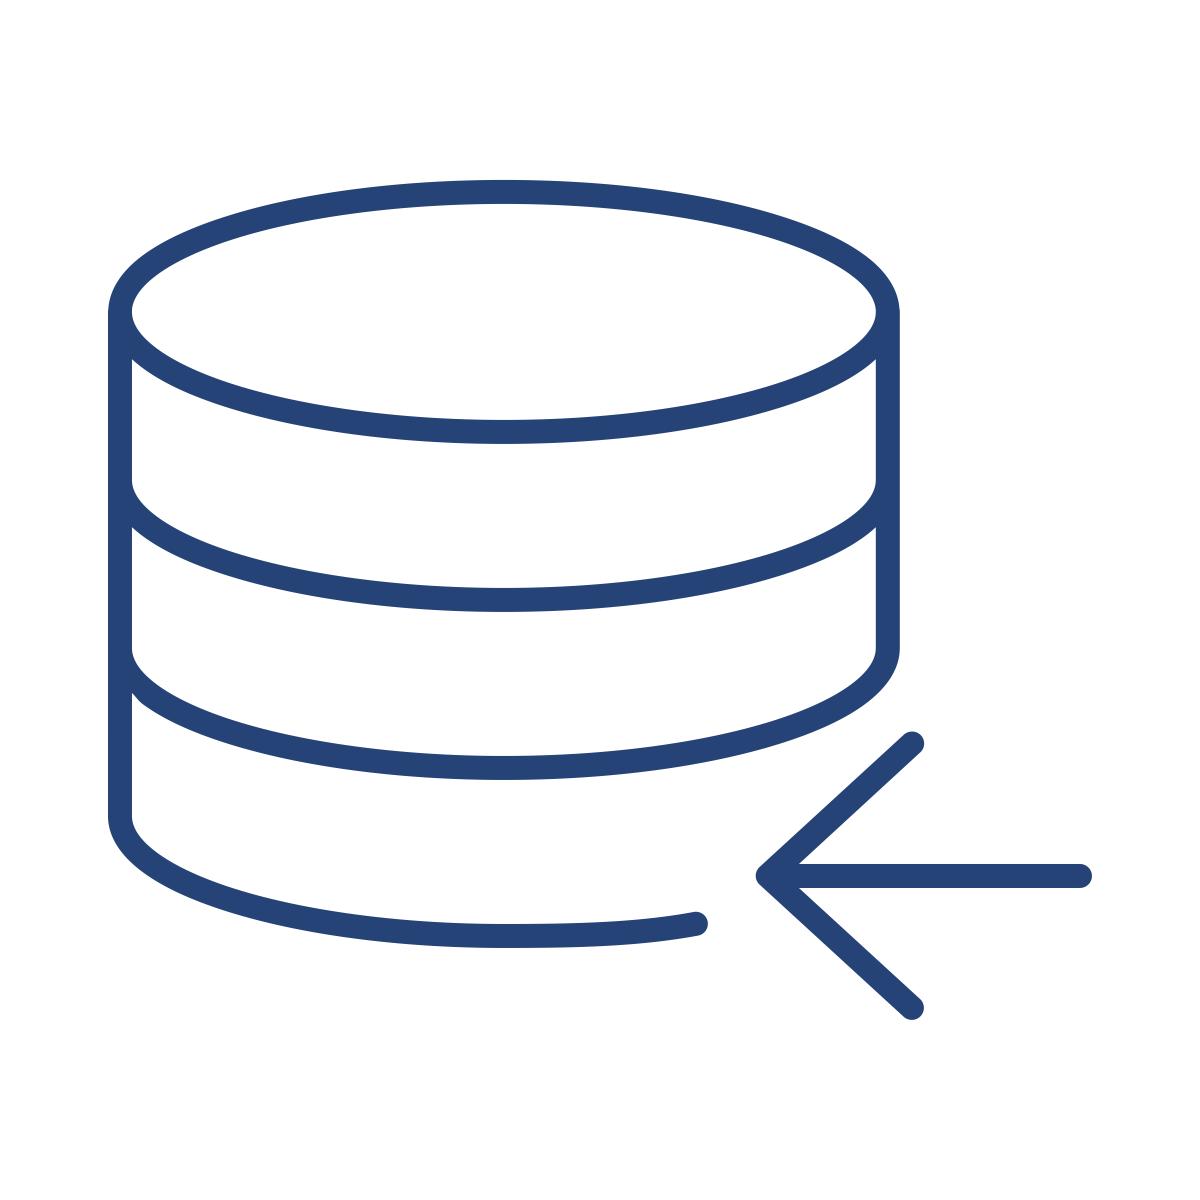 Import external data sources